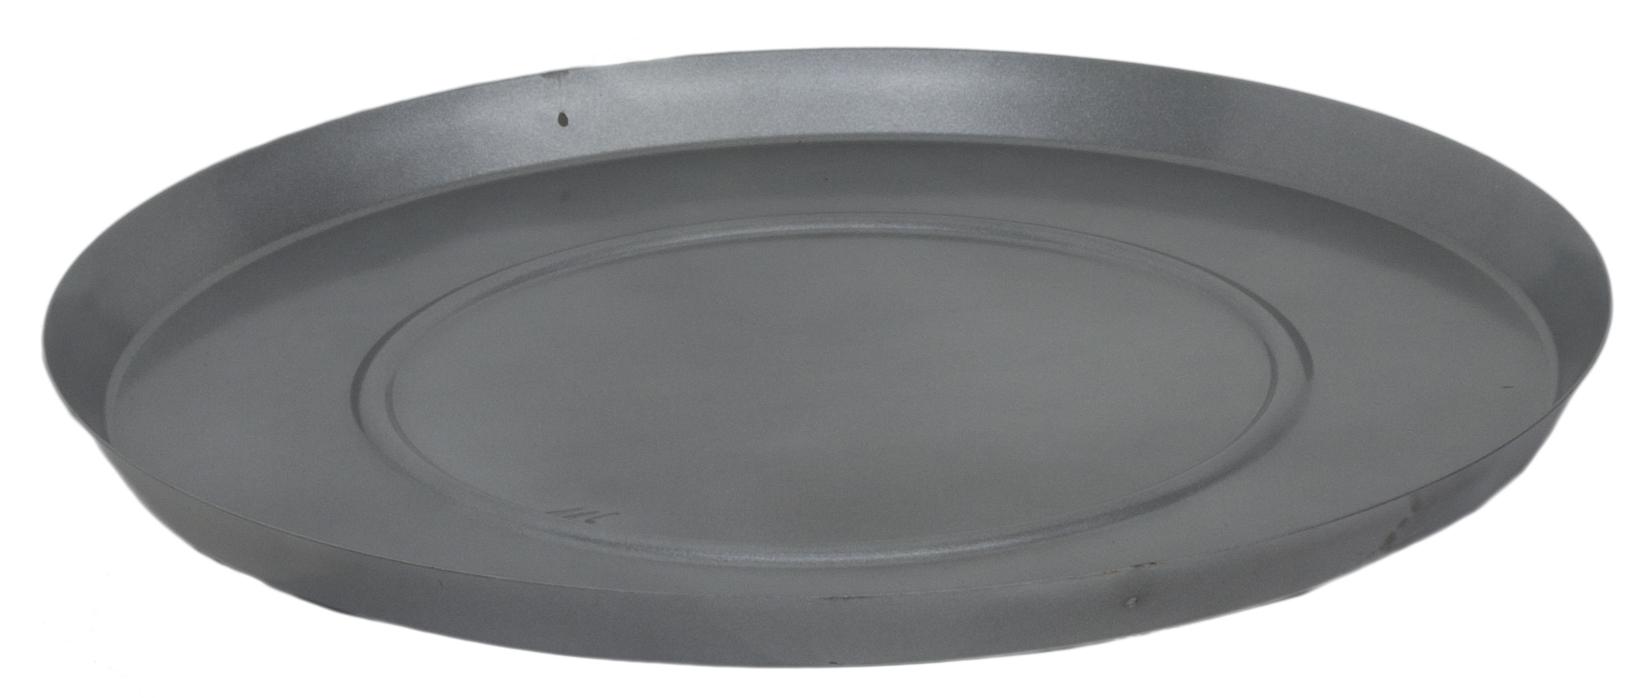 Feuerschale 48cm Stahl